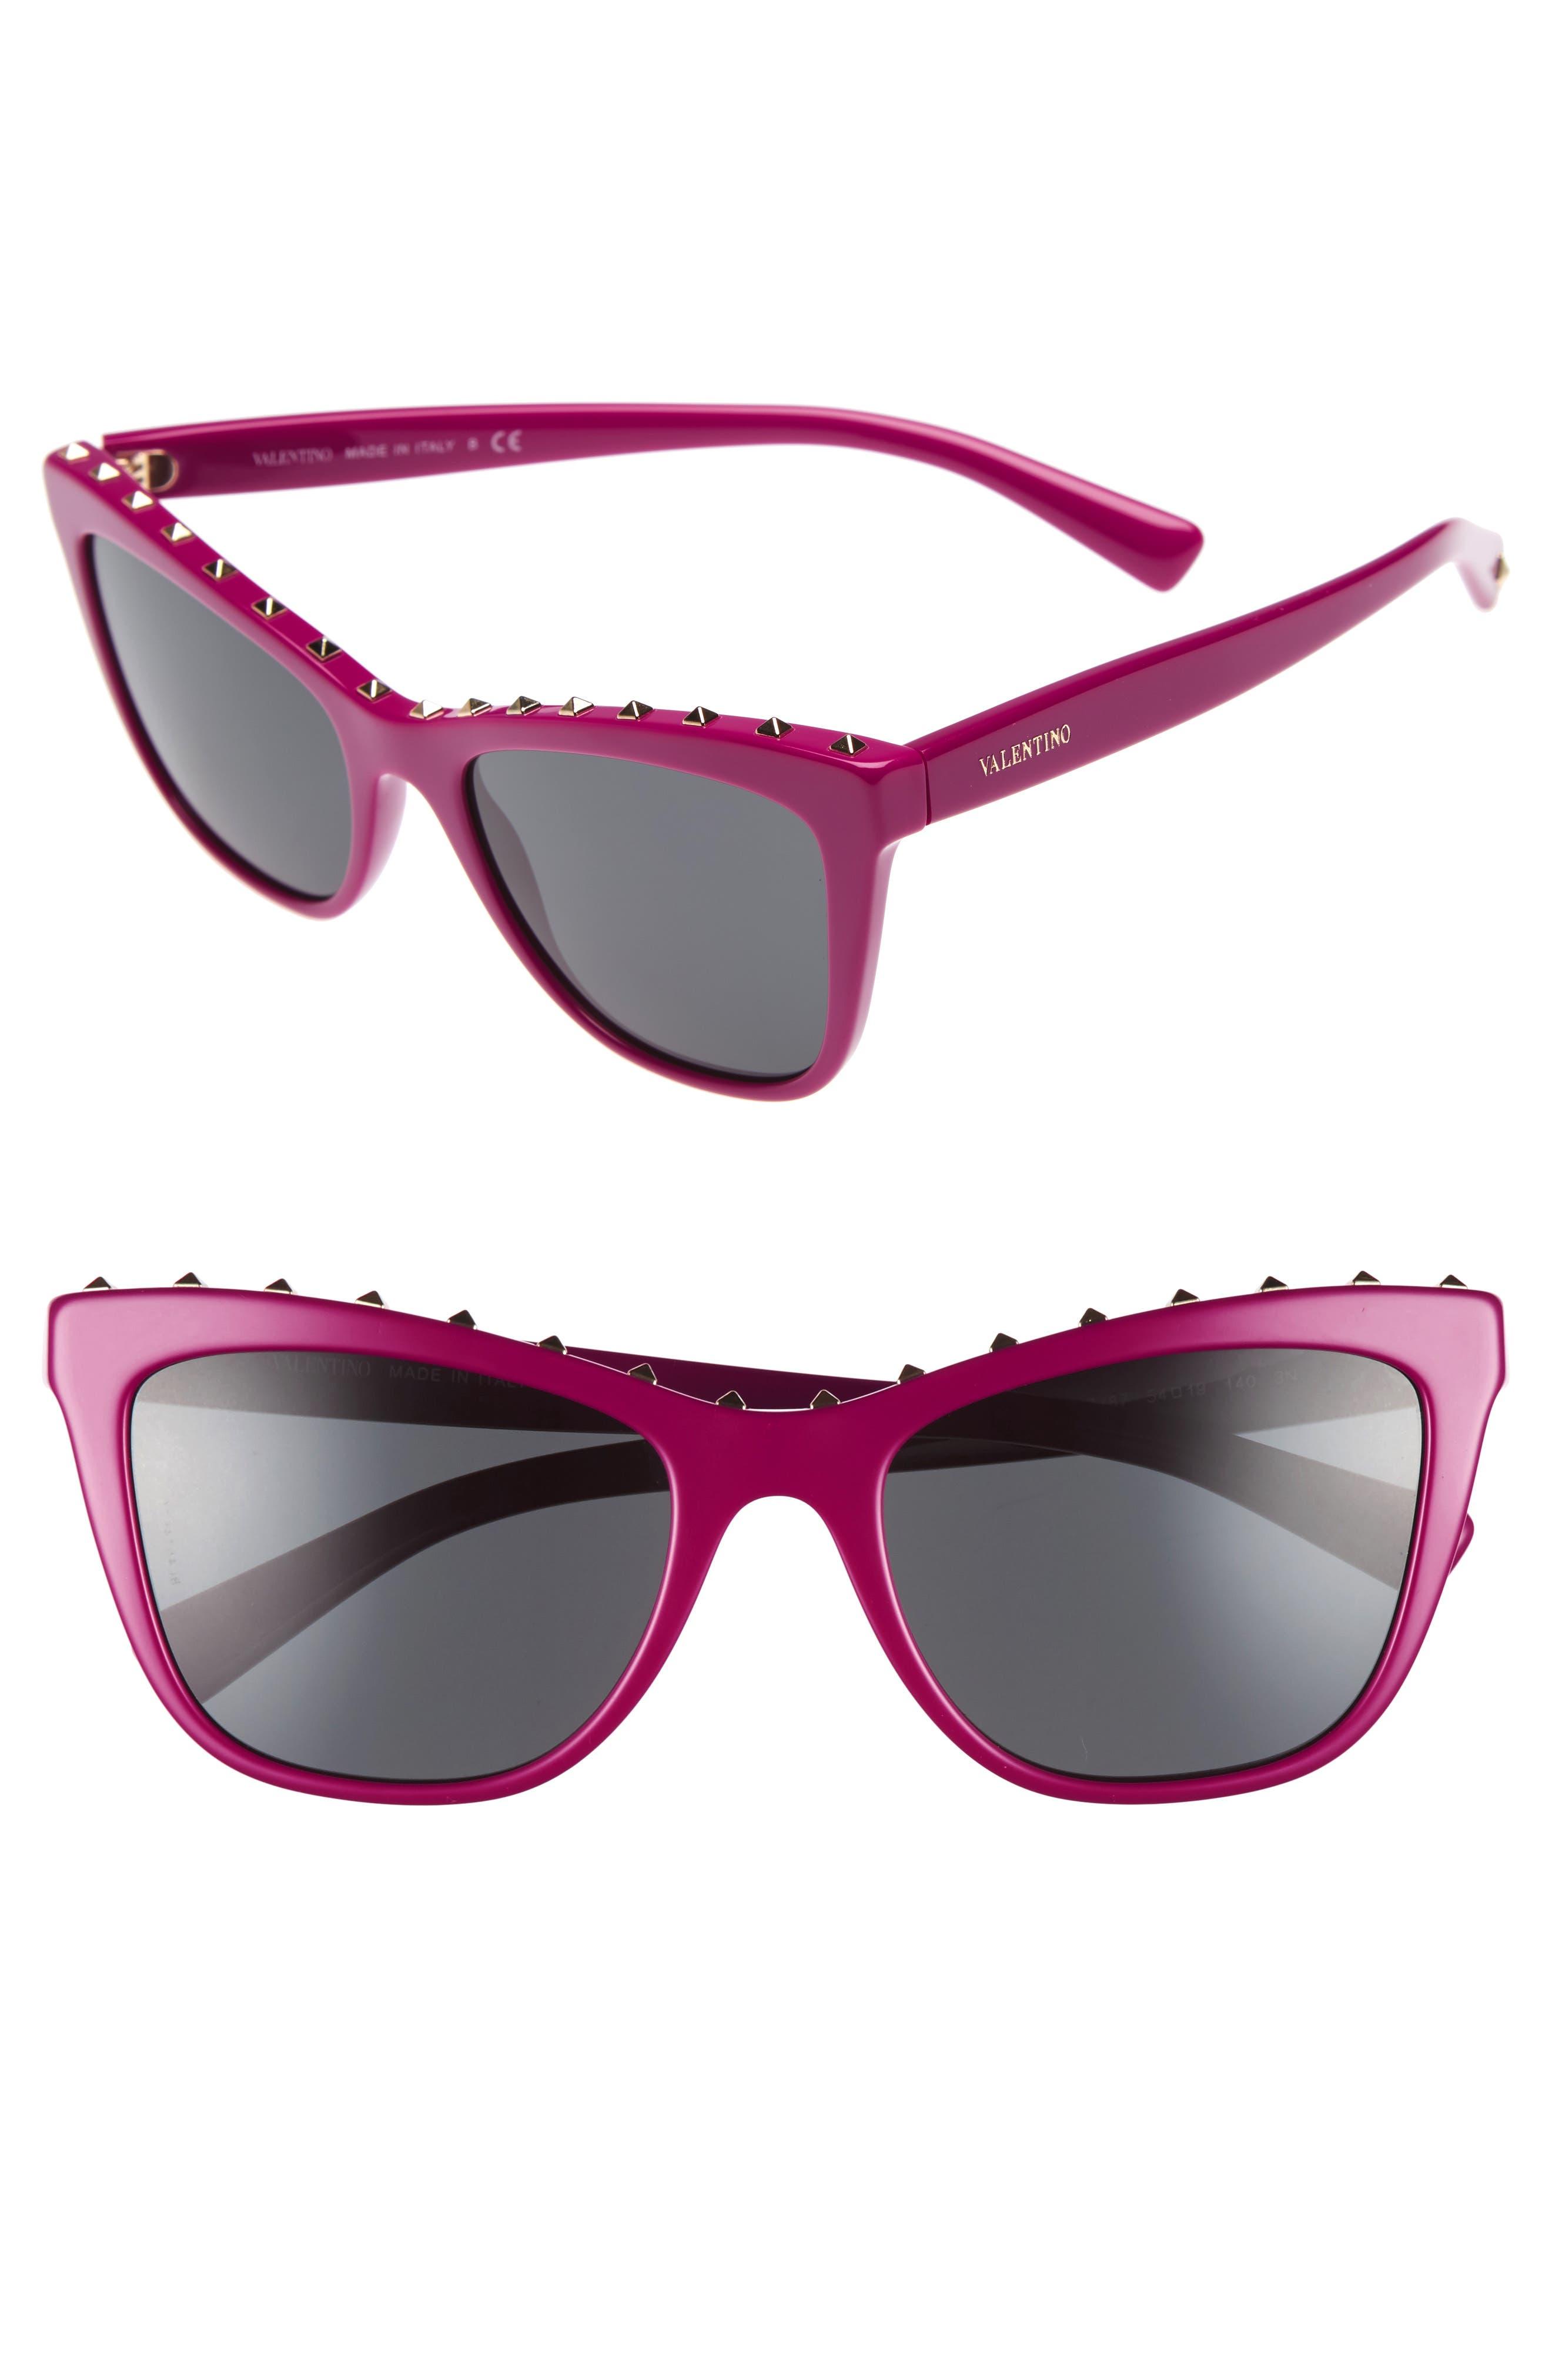 Rockstud 54mm Cat Eye Sunglasses,                             Main thumbnail 1, color,                             Fuchsia